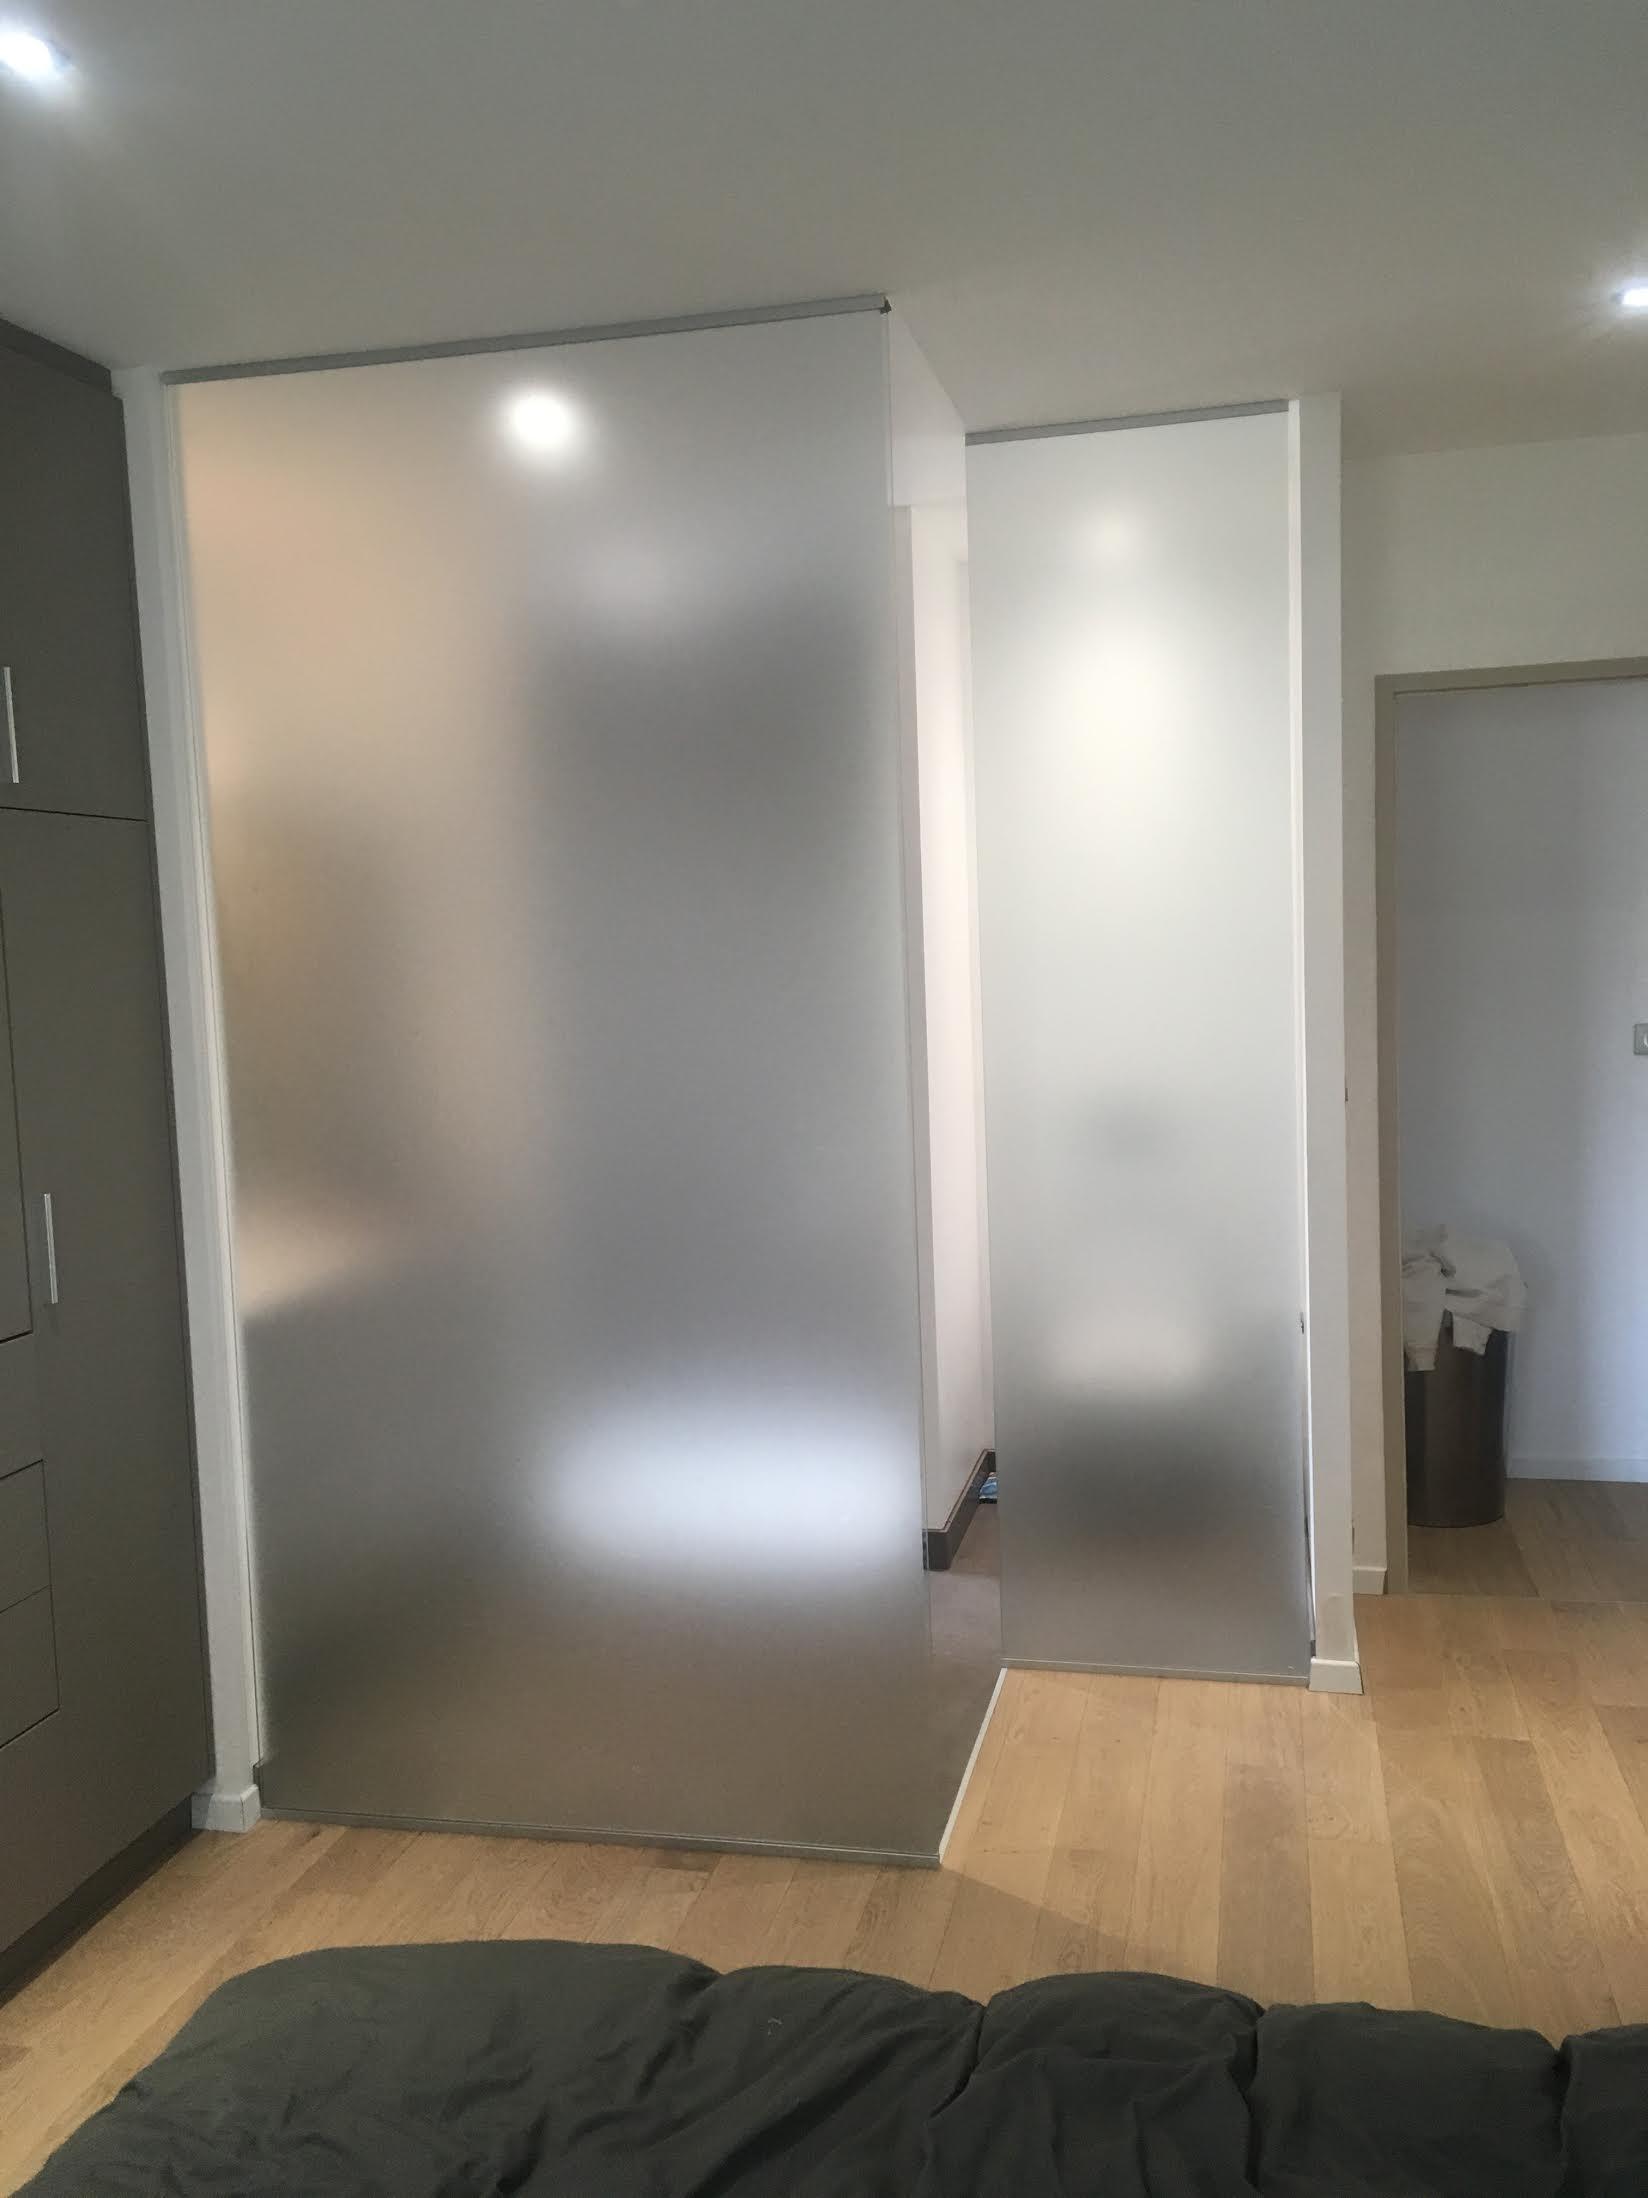 salle de bain archives abm miroiterie vitrerie. Black Bedroom Furniture Sets. Home Design Ideas